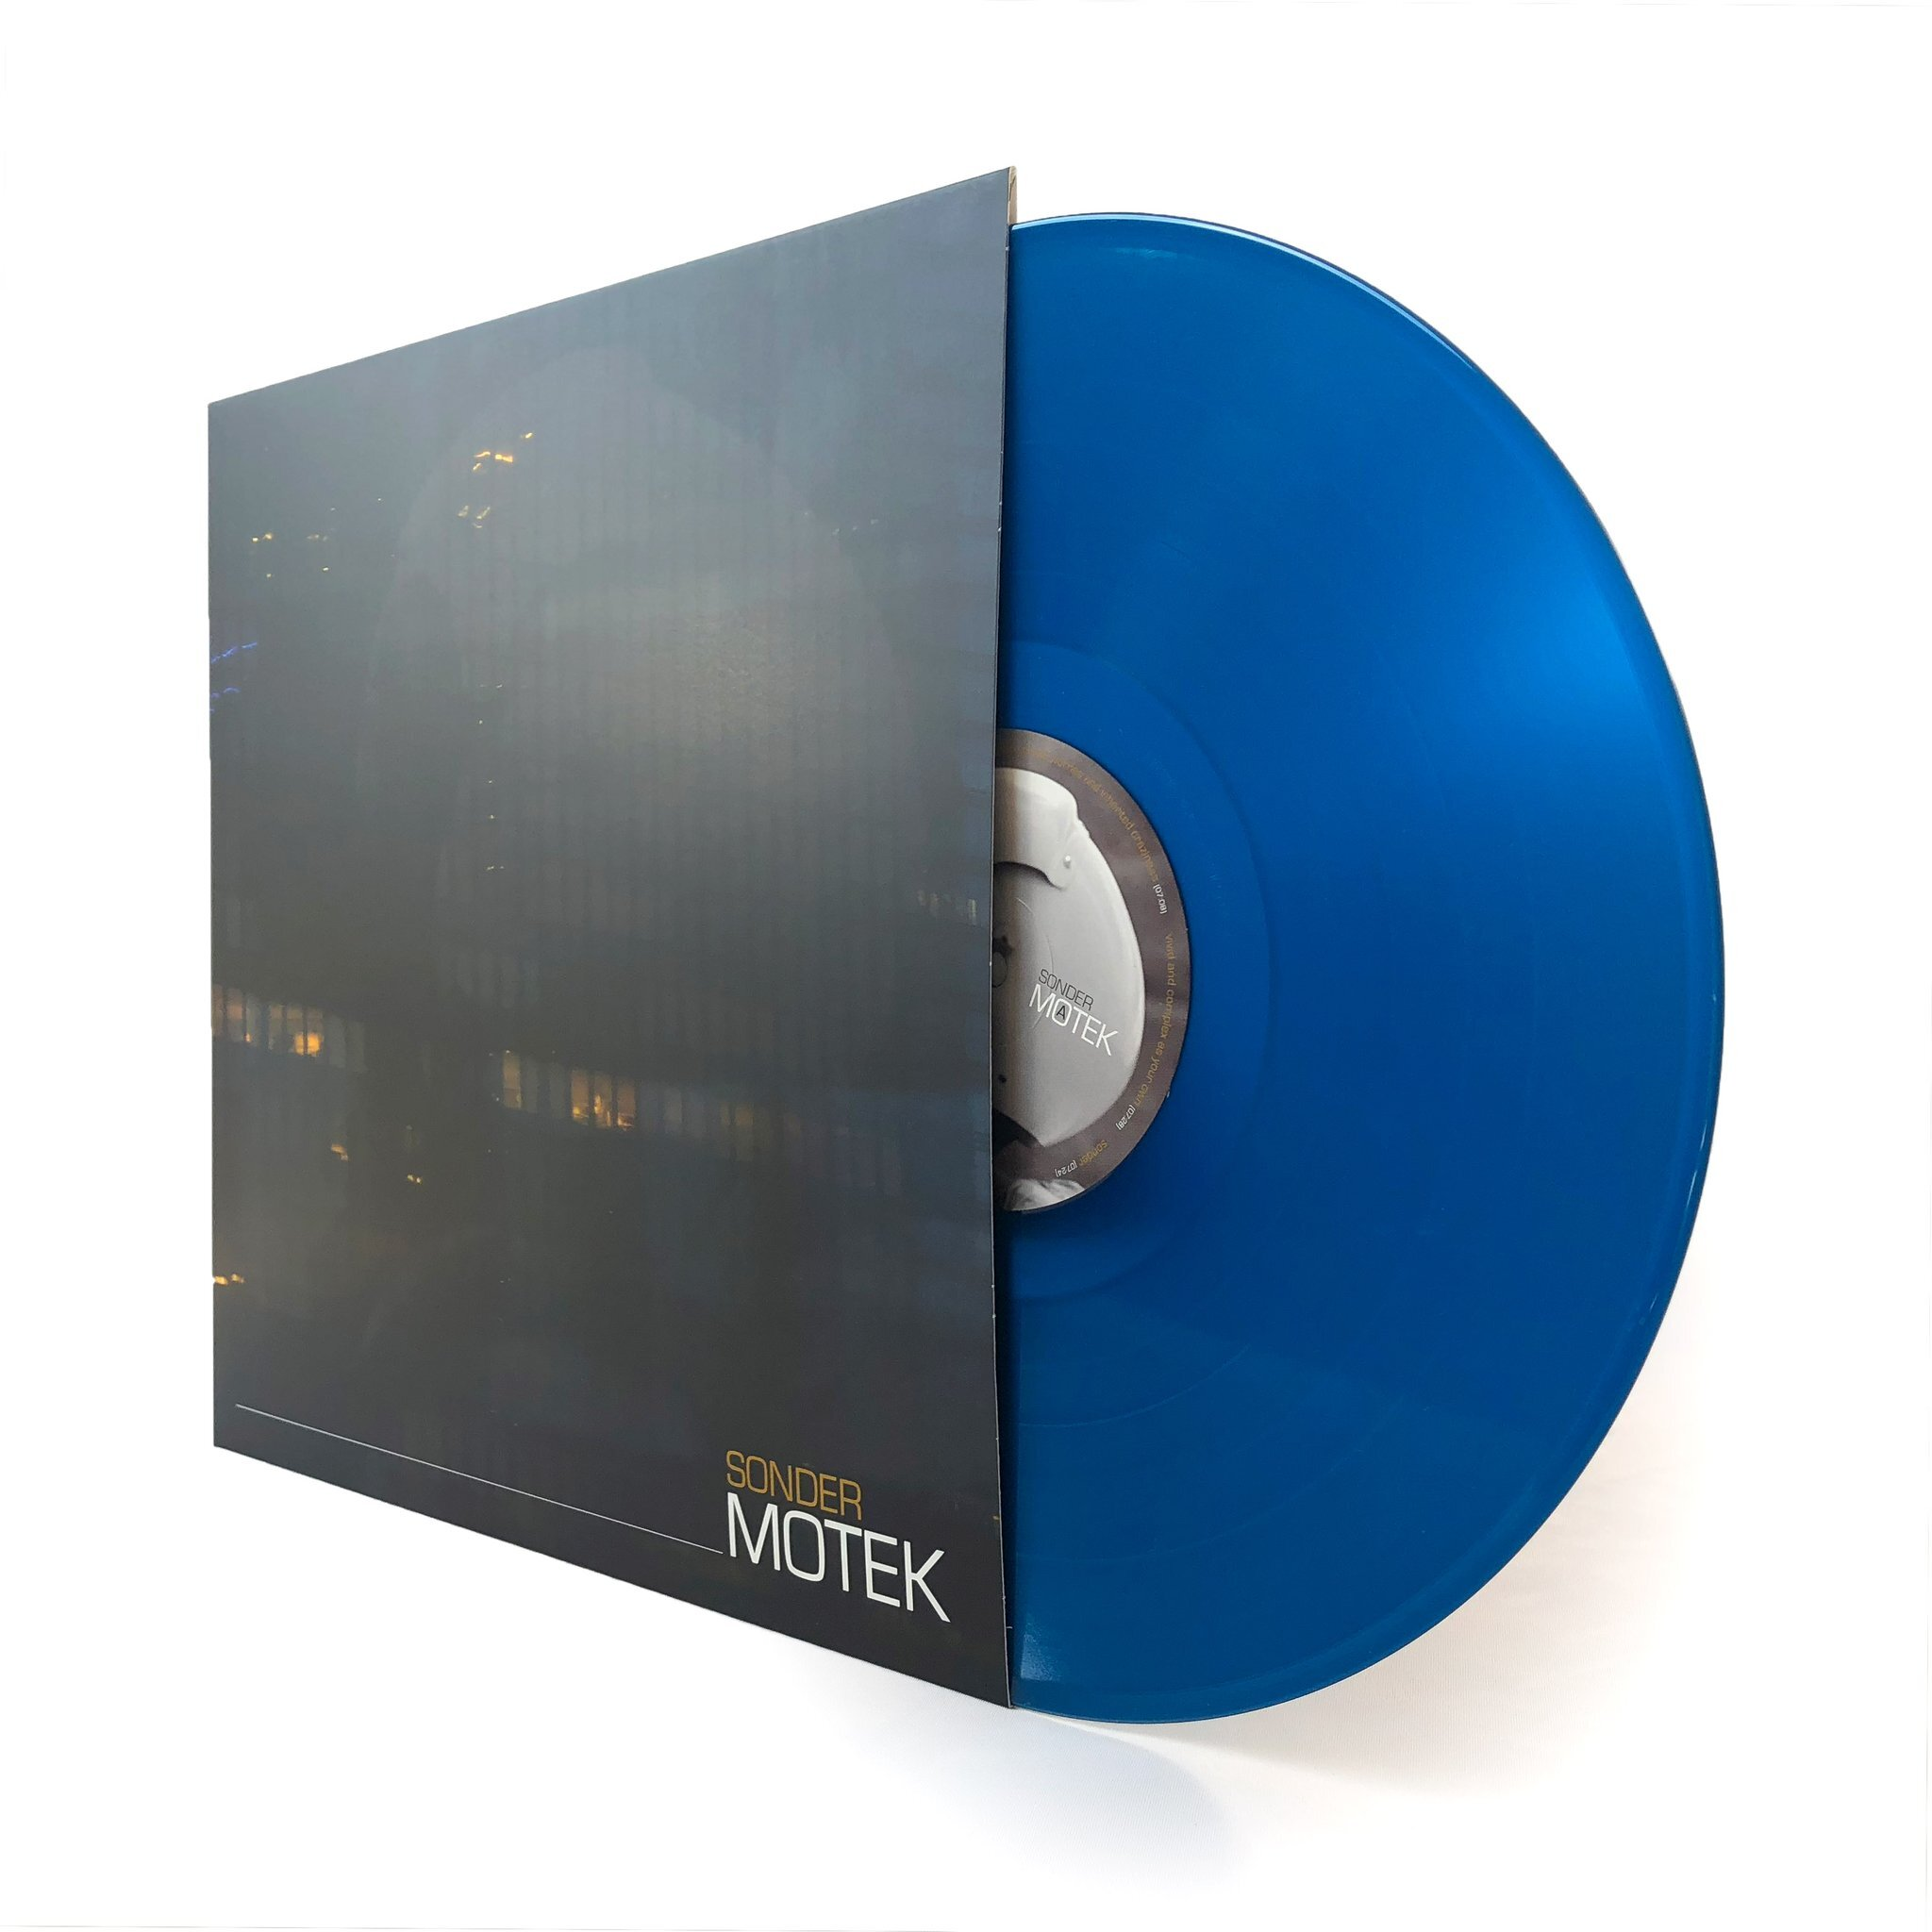 Motek • Sonder [LP] - Released Oct. 2nd, 2013